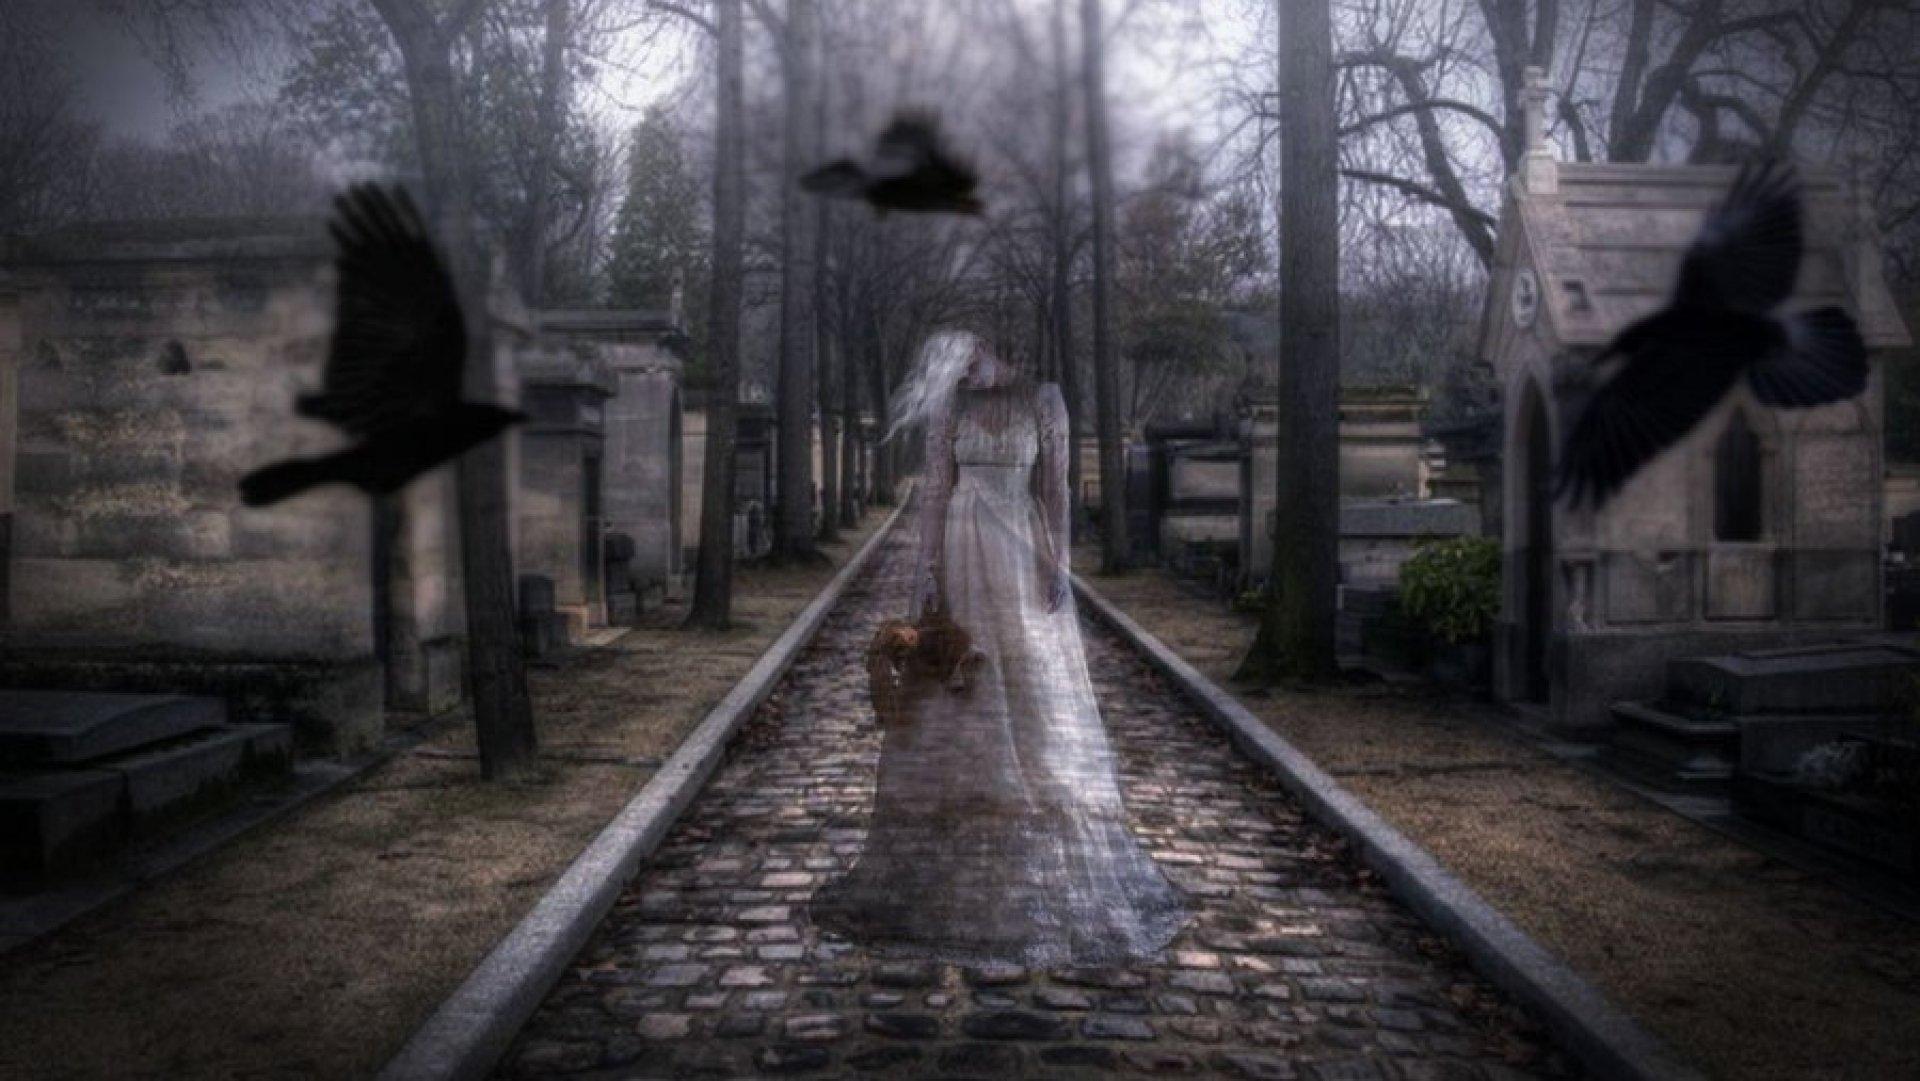 призраки картинки с призраками низкие